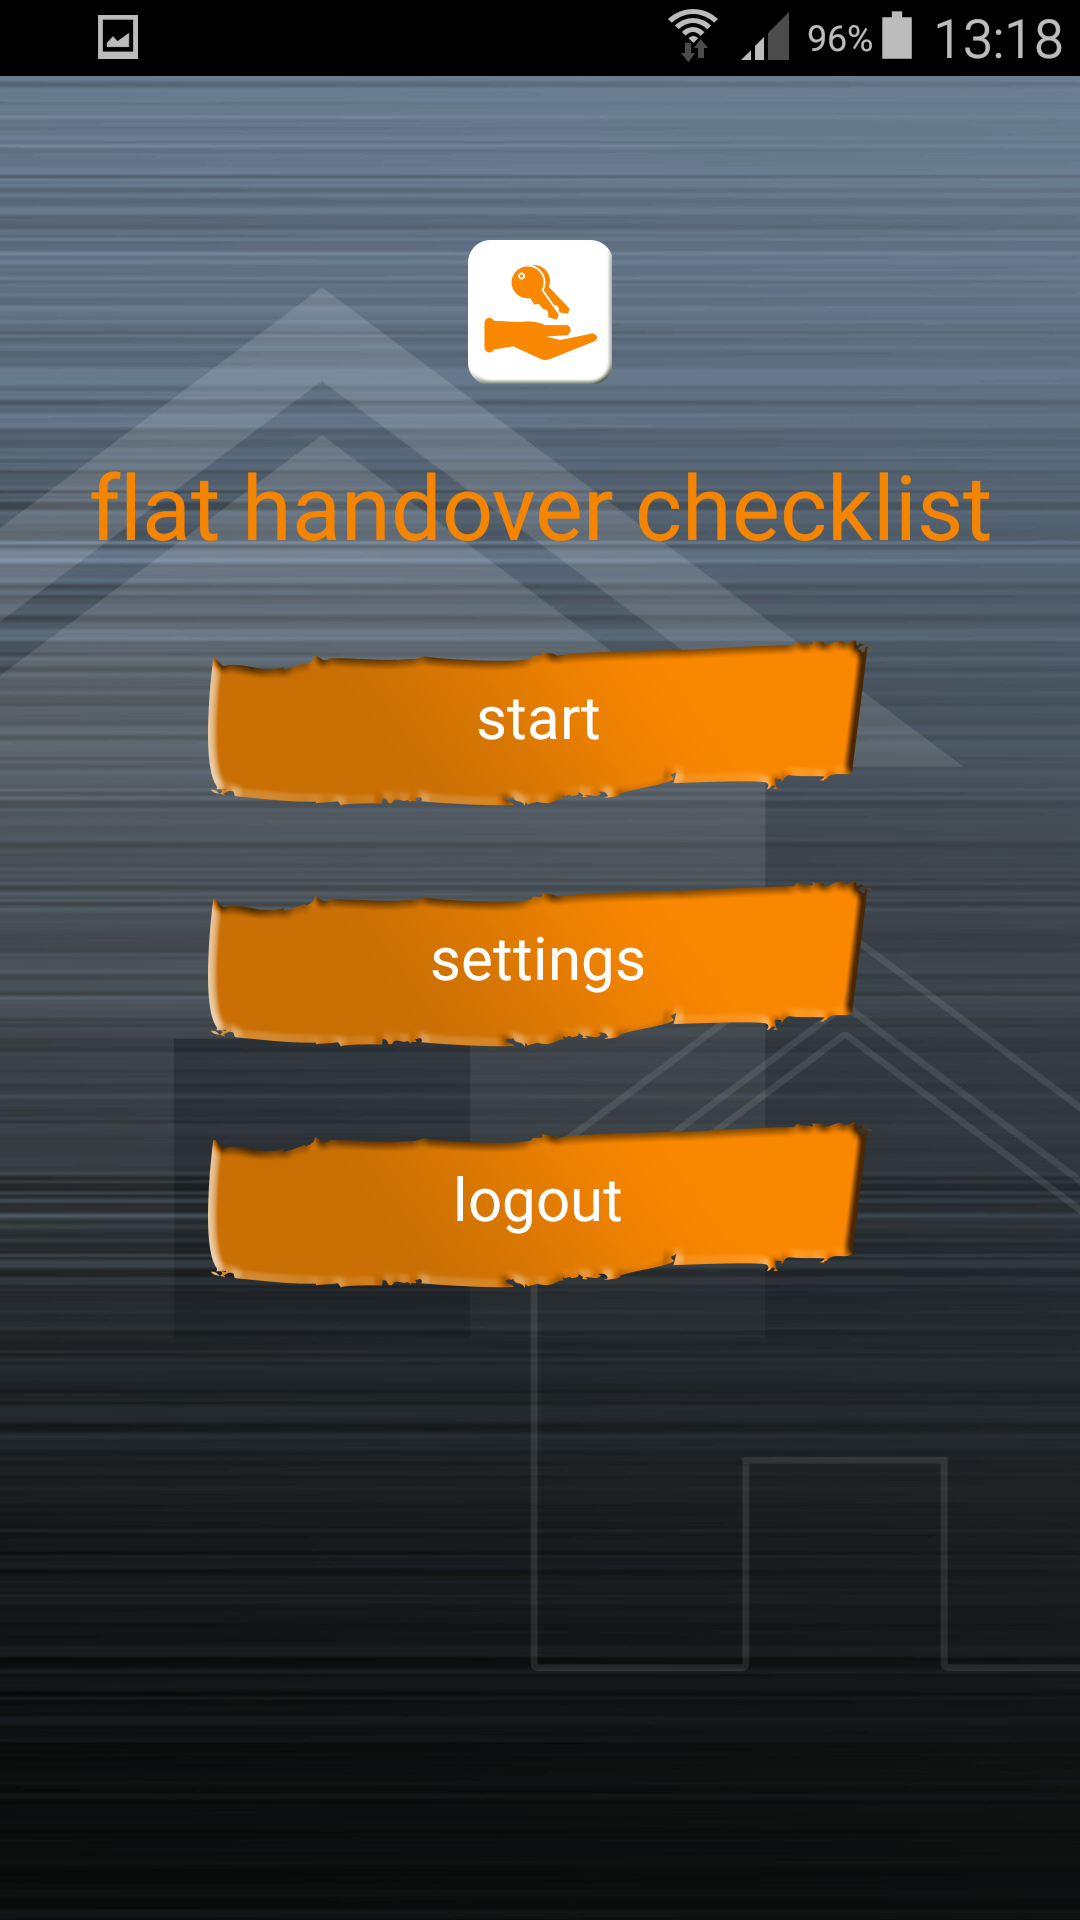 ginstr_app_flatHandoverChecklist_EN_2